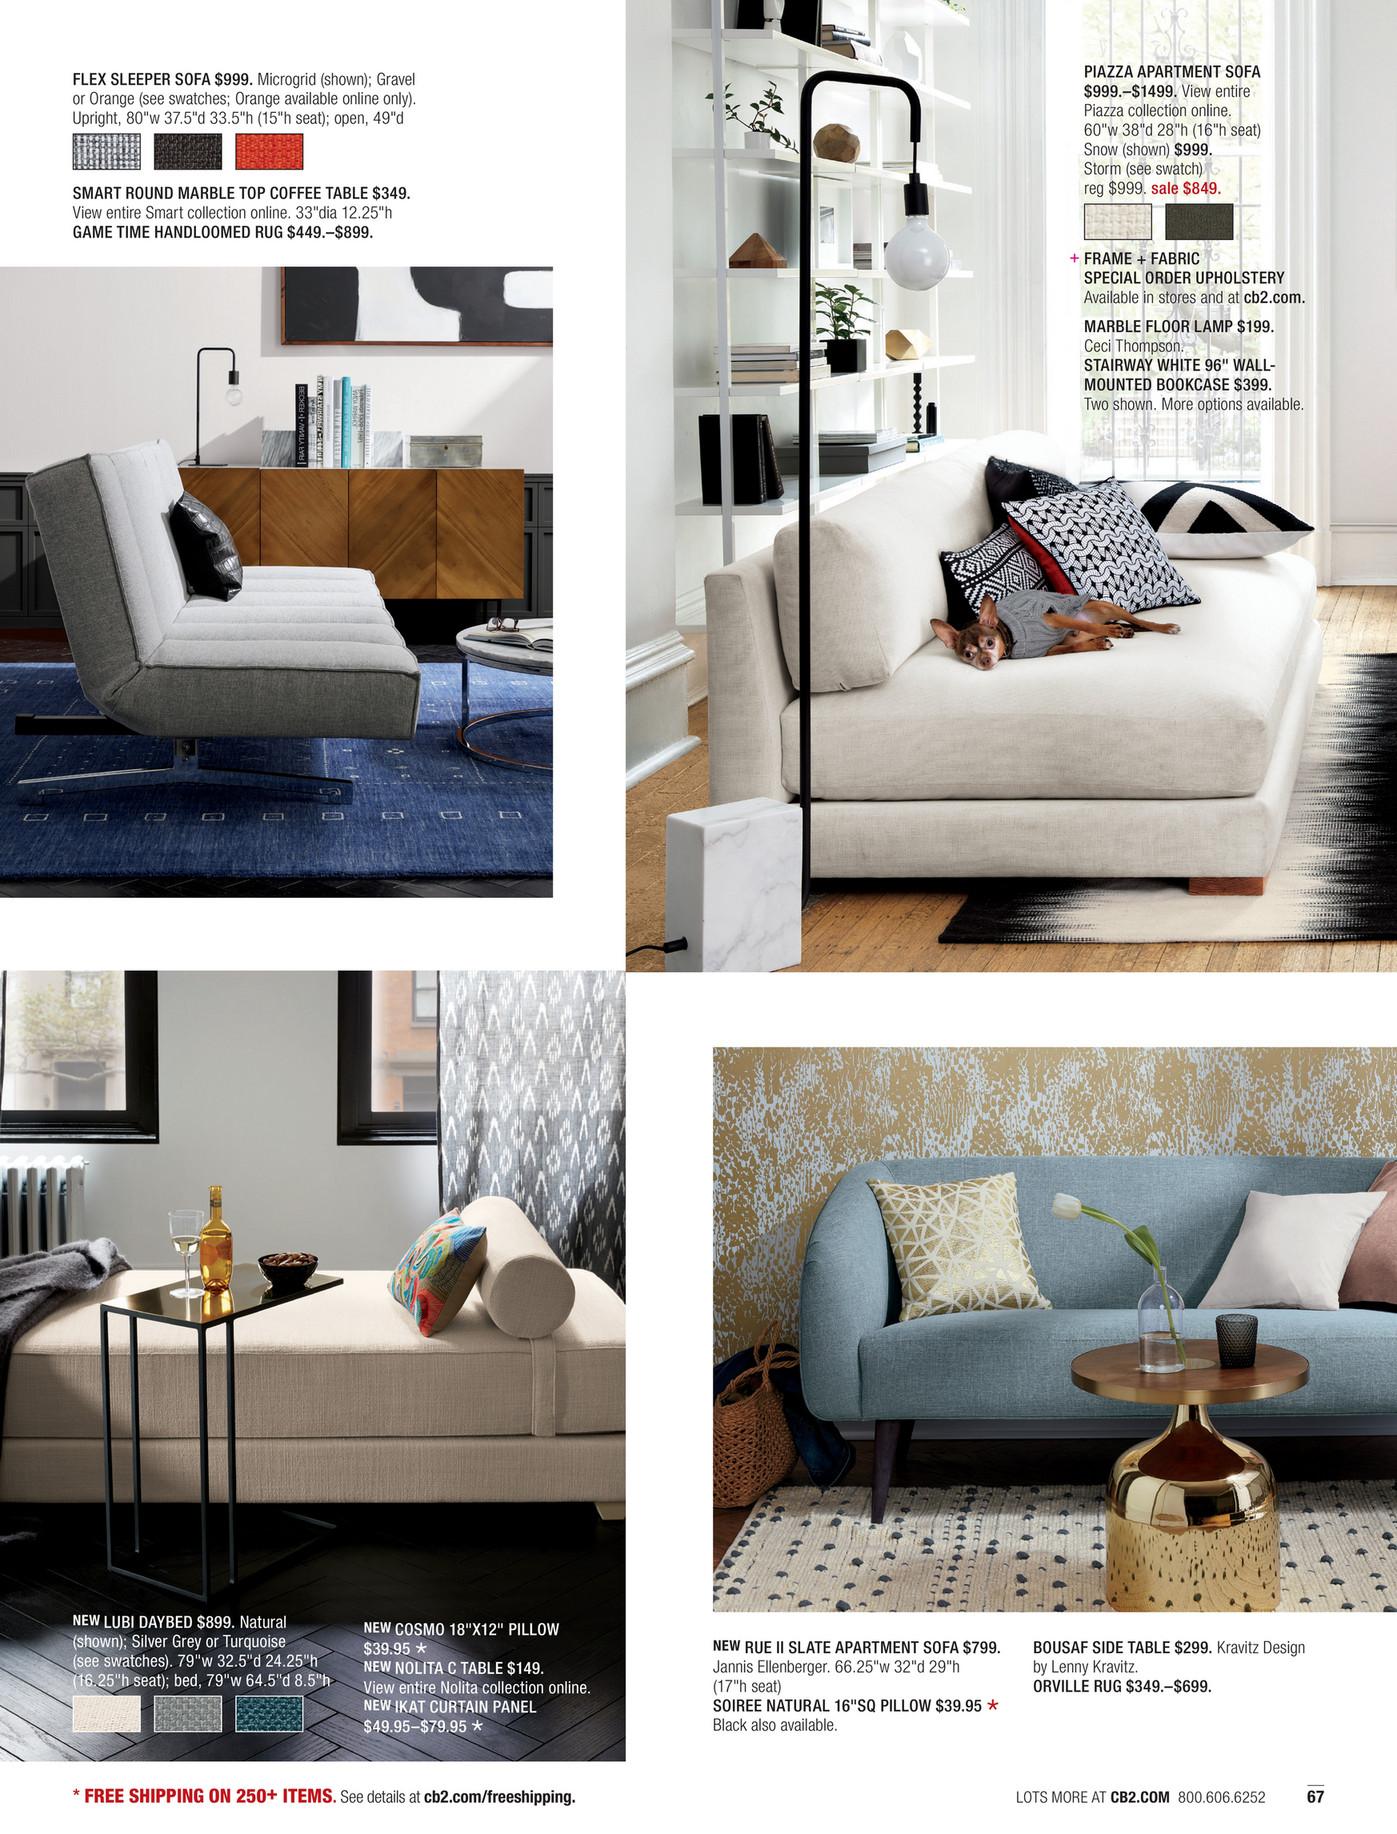 Cb2 Flex Sleeper Sofa Hereo